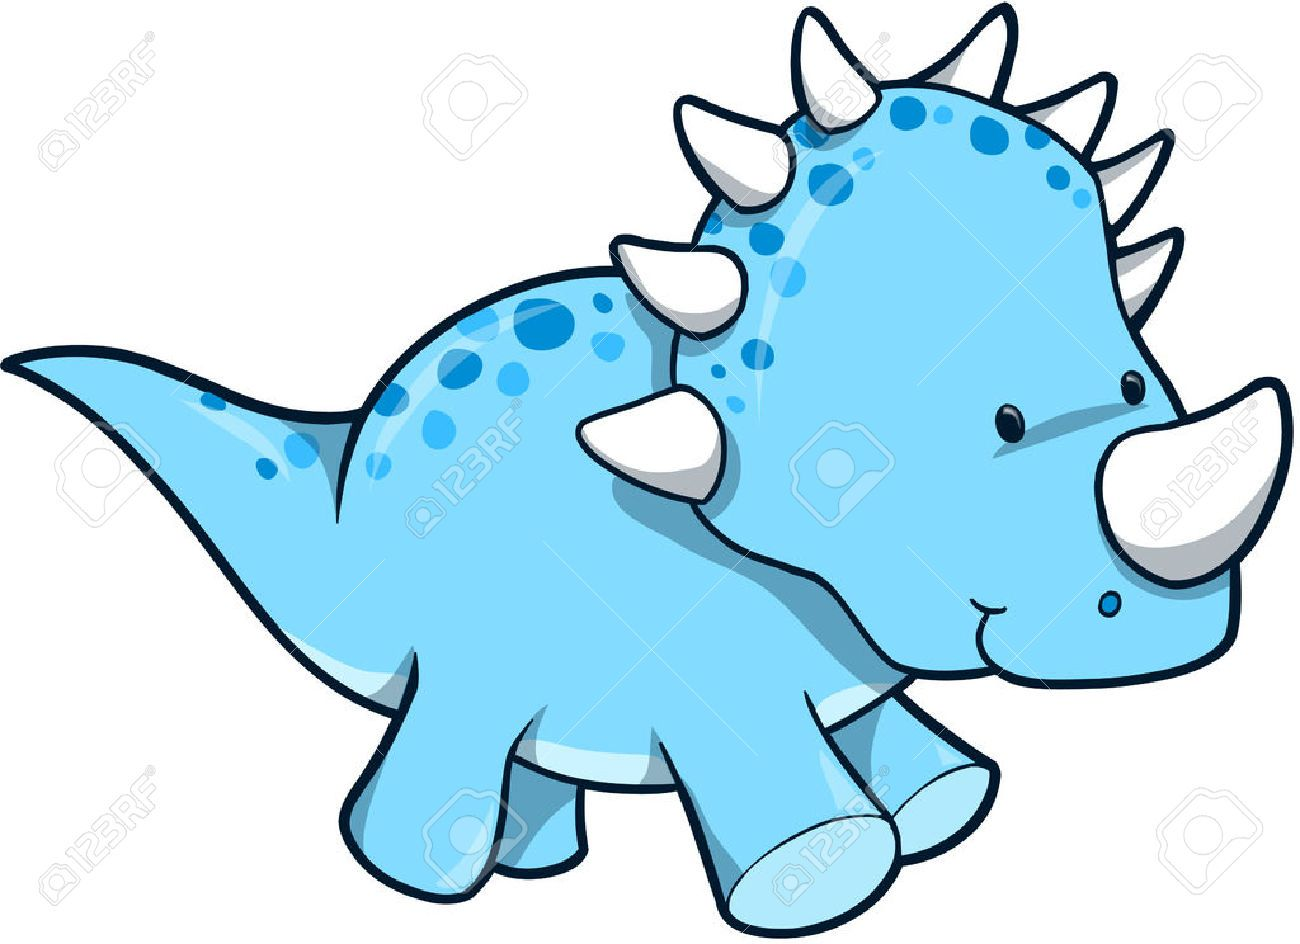 small resolution of blue dinosaur vector illustration royalty free cliparts vectors